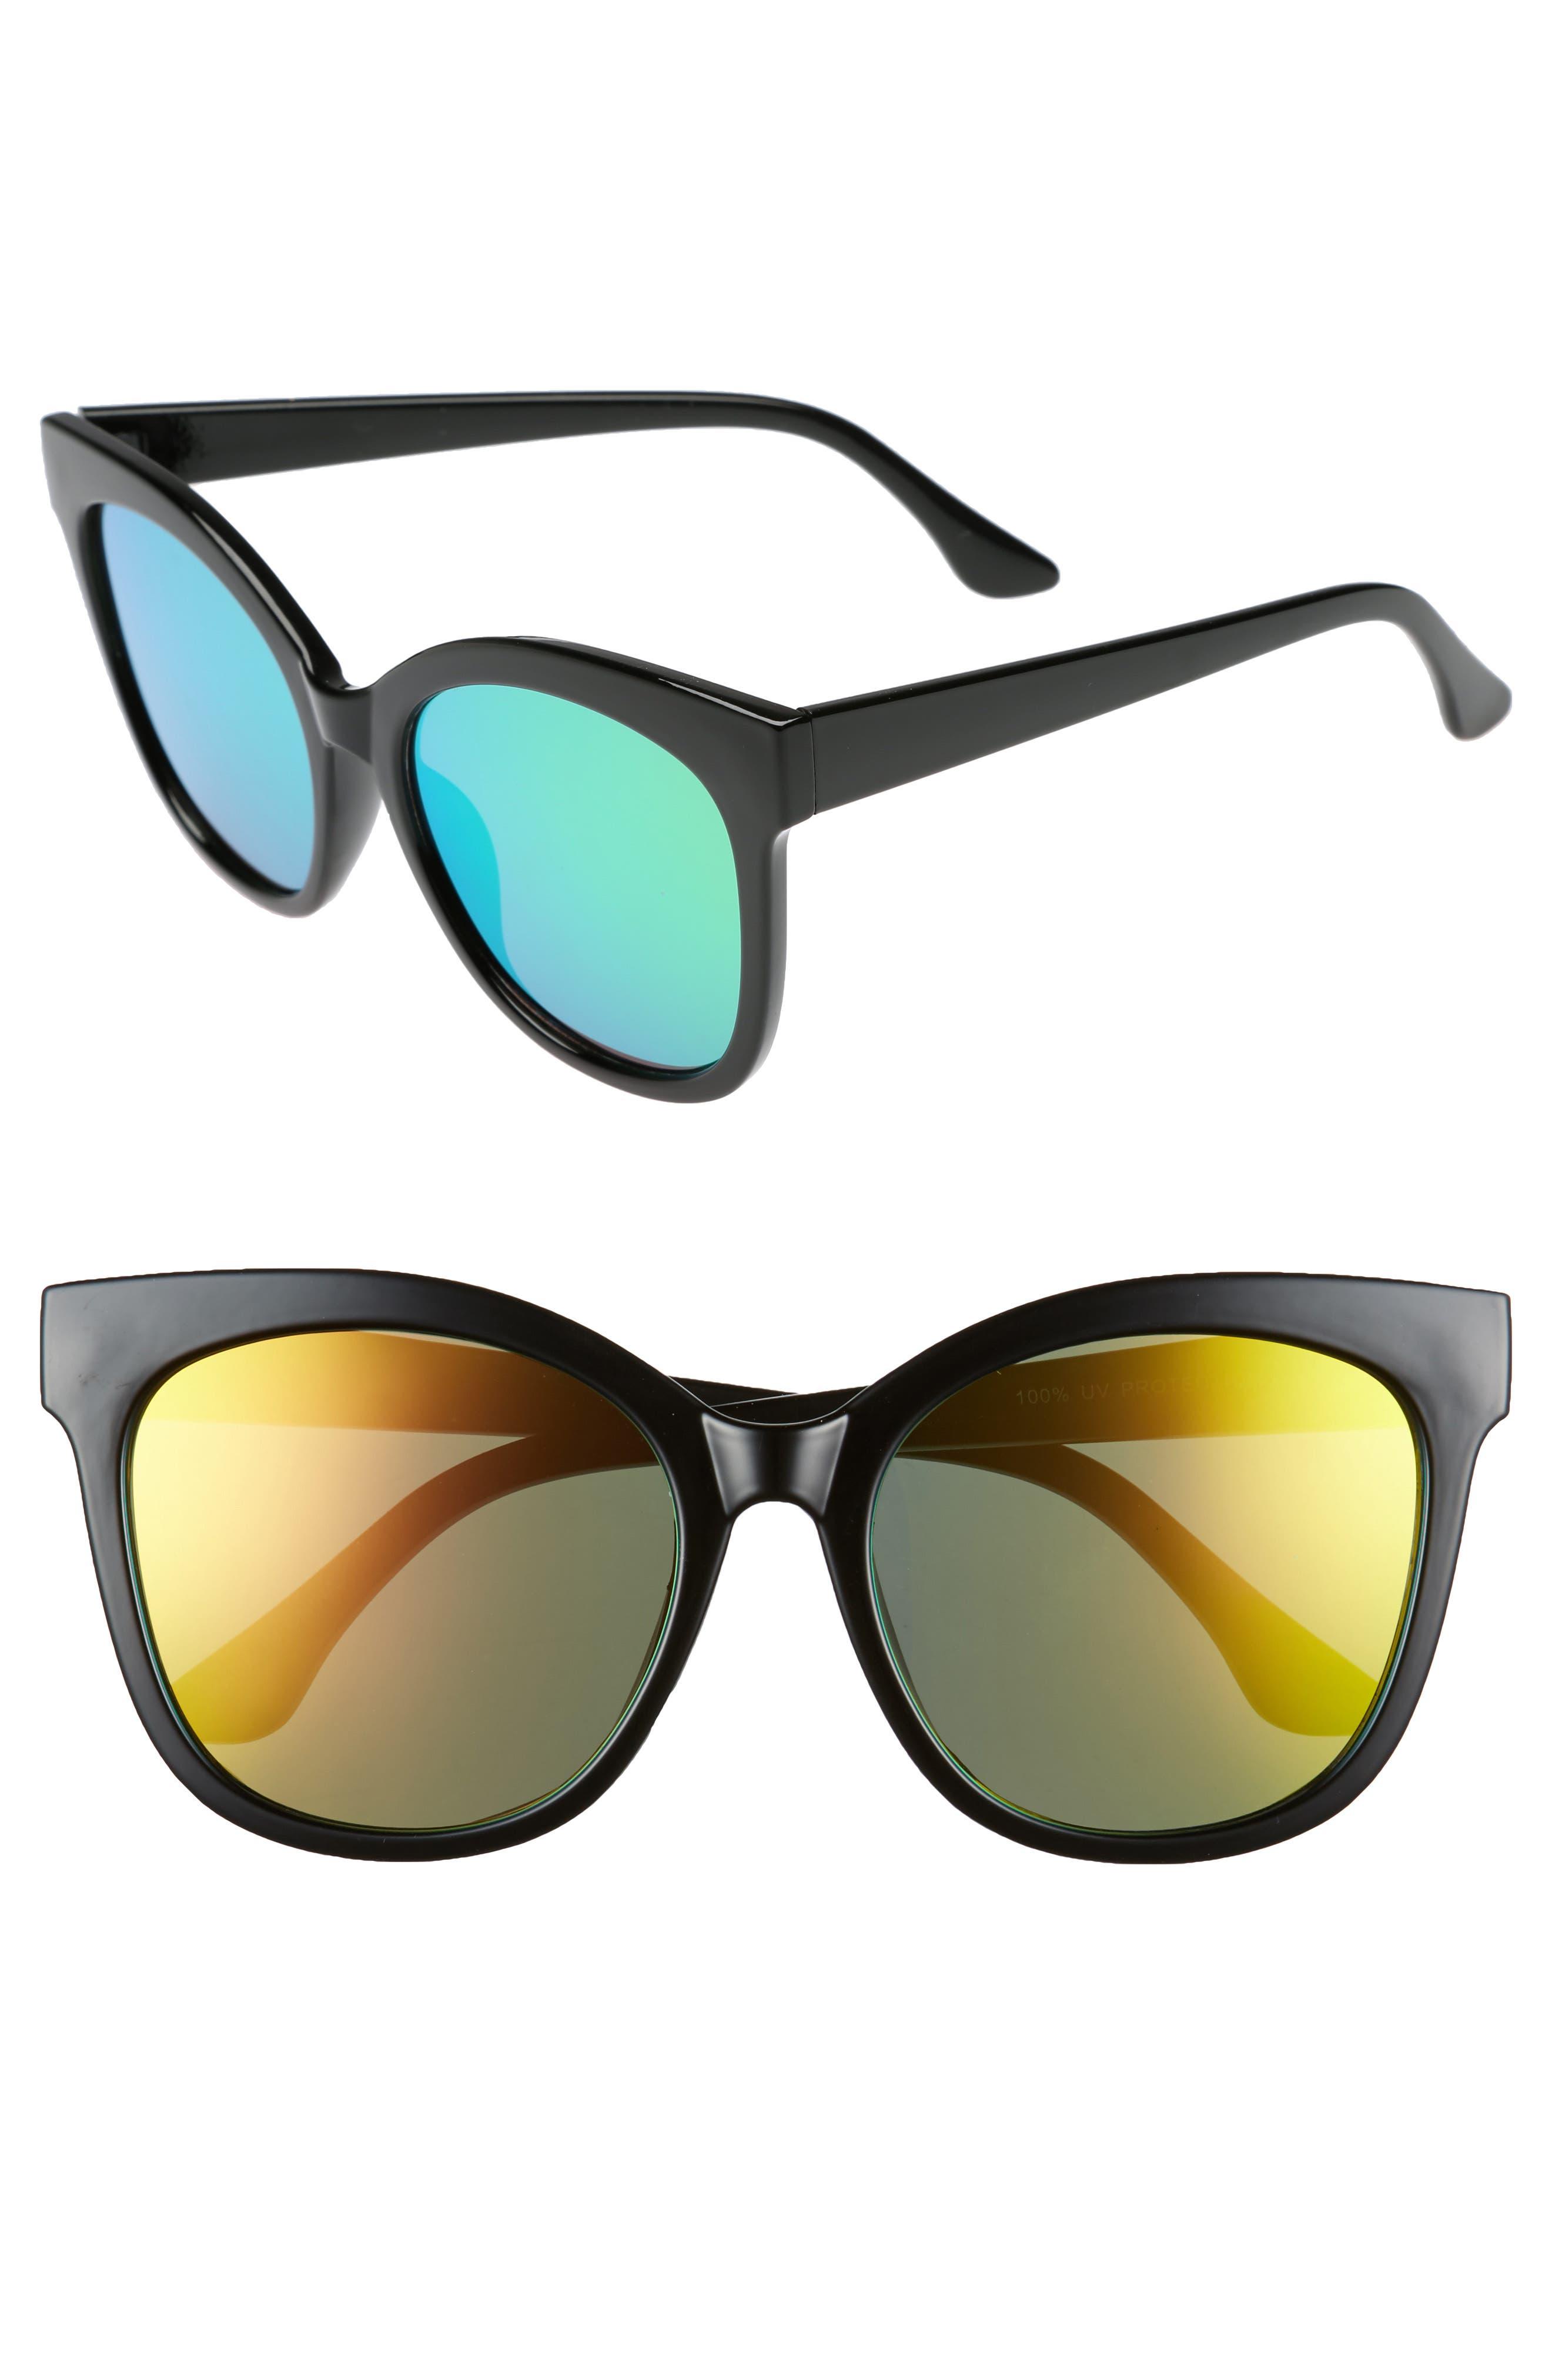 55mm Square Sunglasses,                         Main,                         color, Black/ Pink